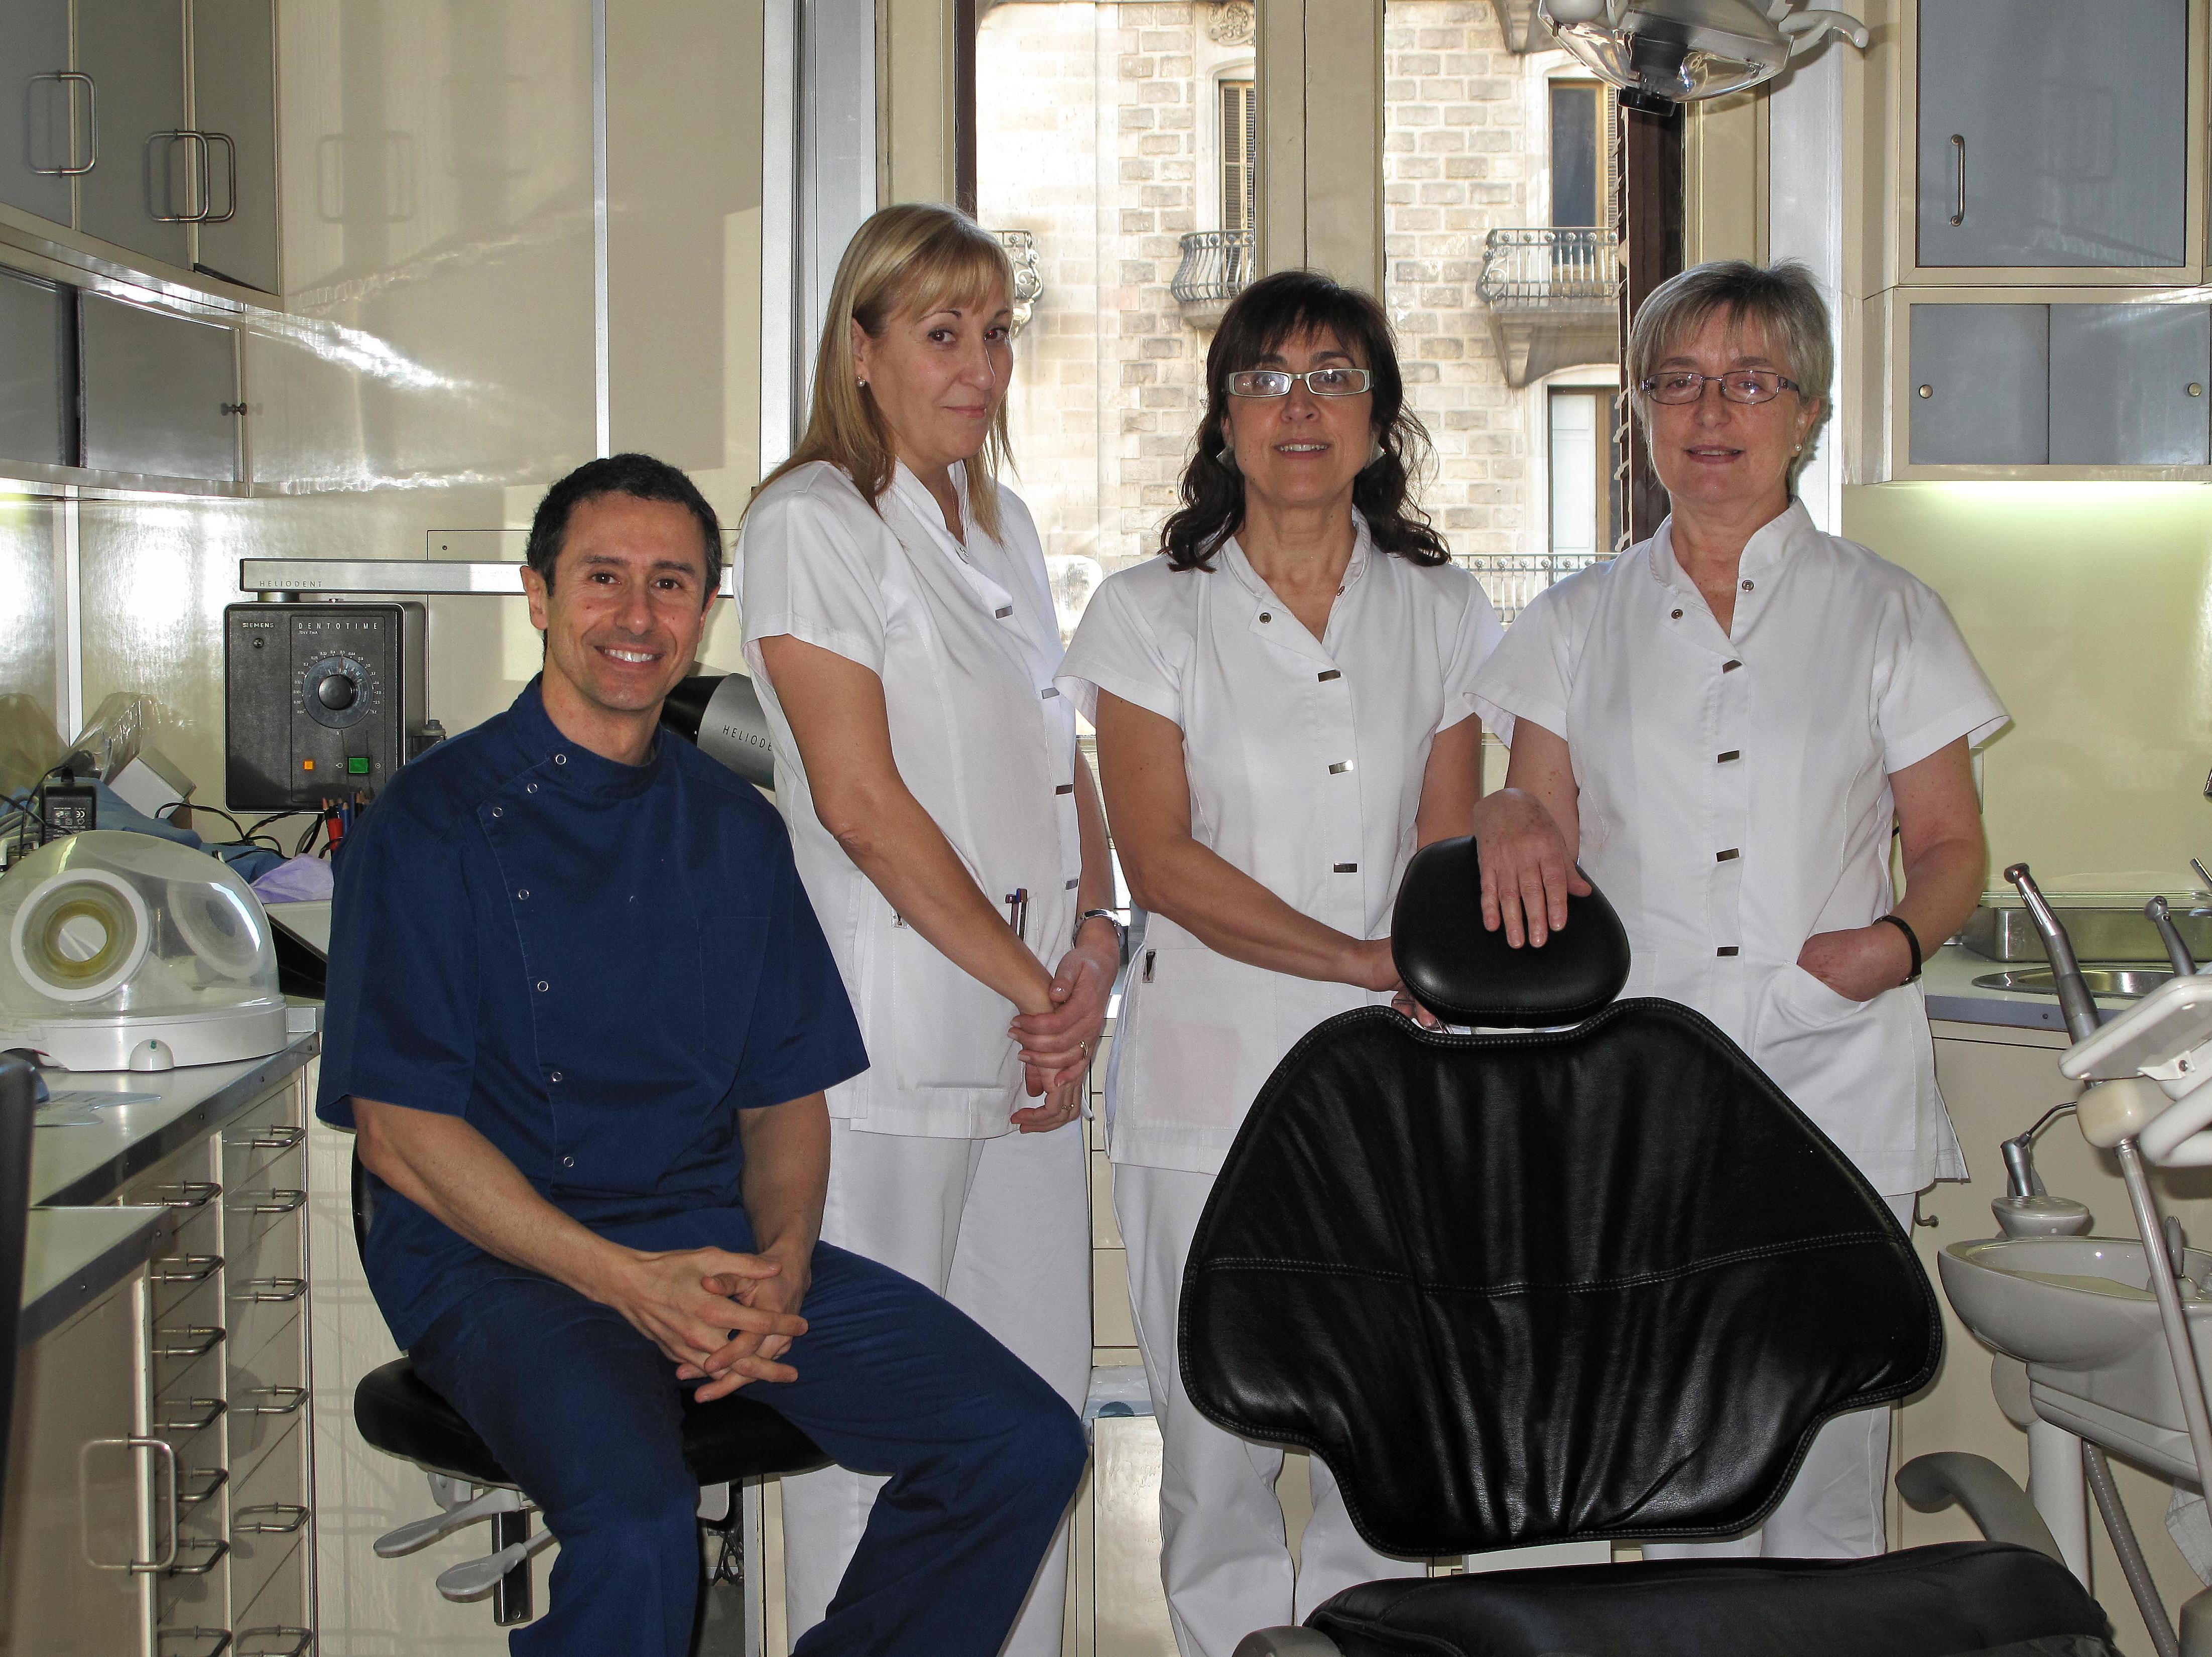 *Ortodoncia invisible a buen precio en la Dreta de L'Eixample de Barcelona en Clínica Dr. Esteve Padrós